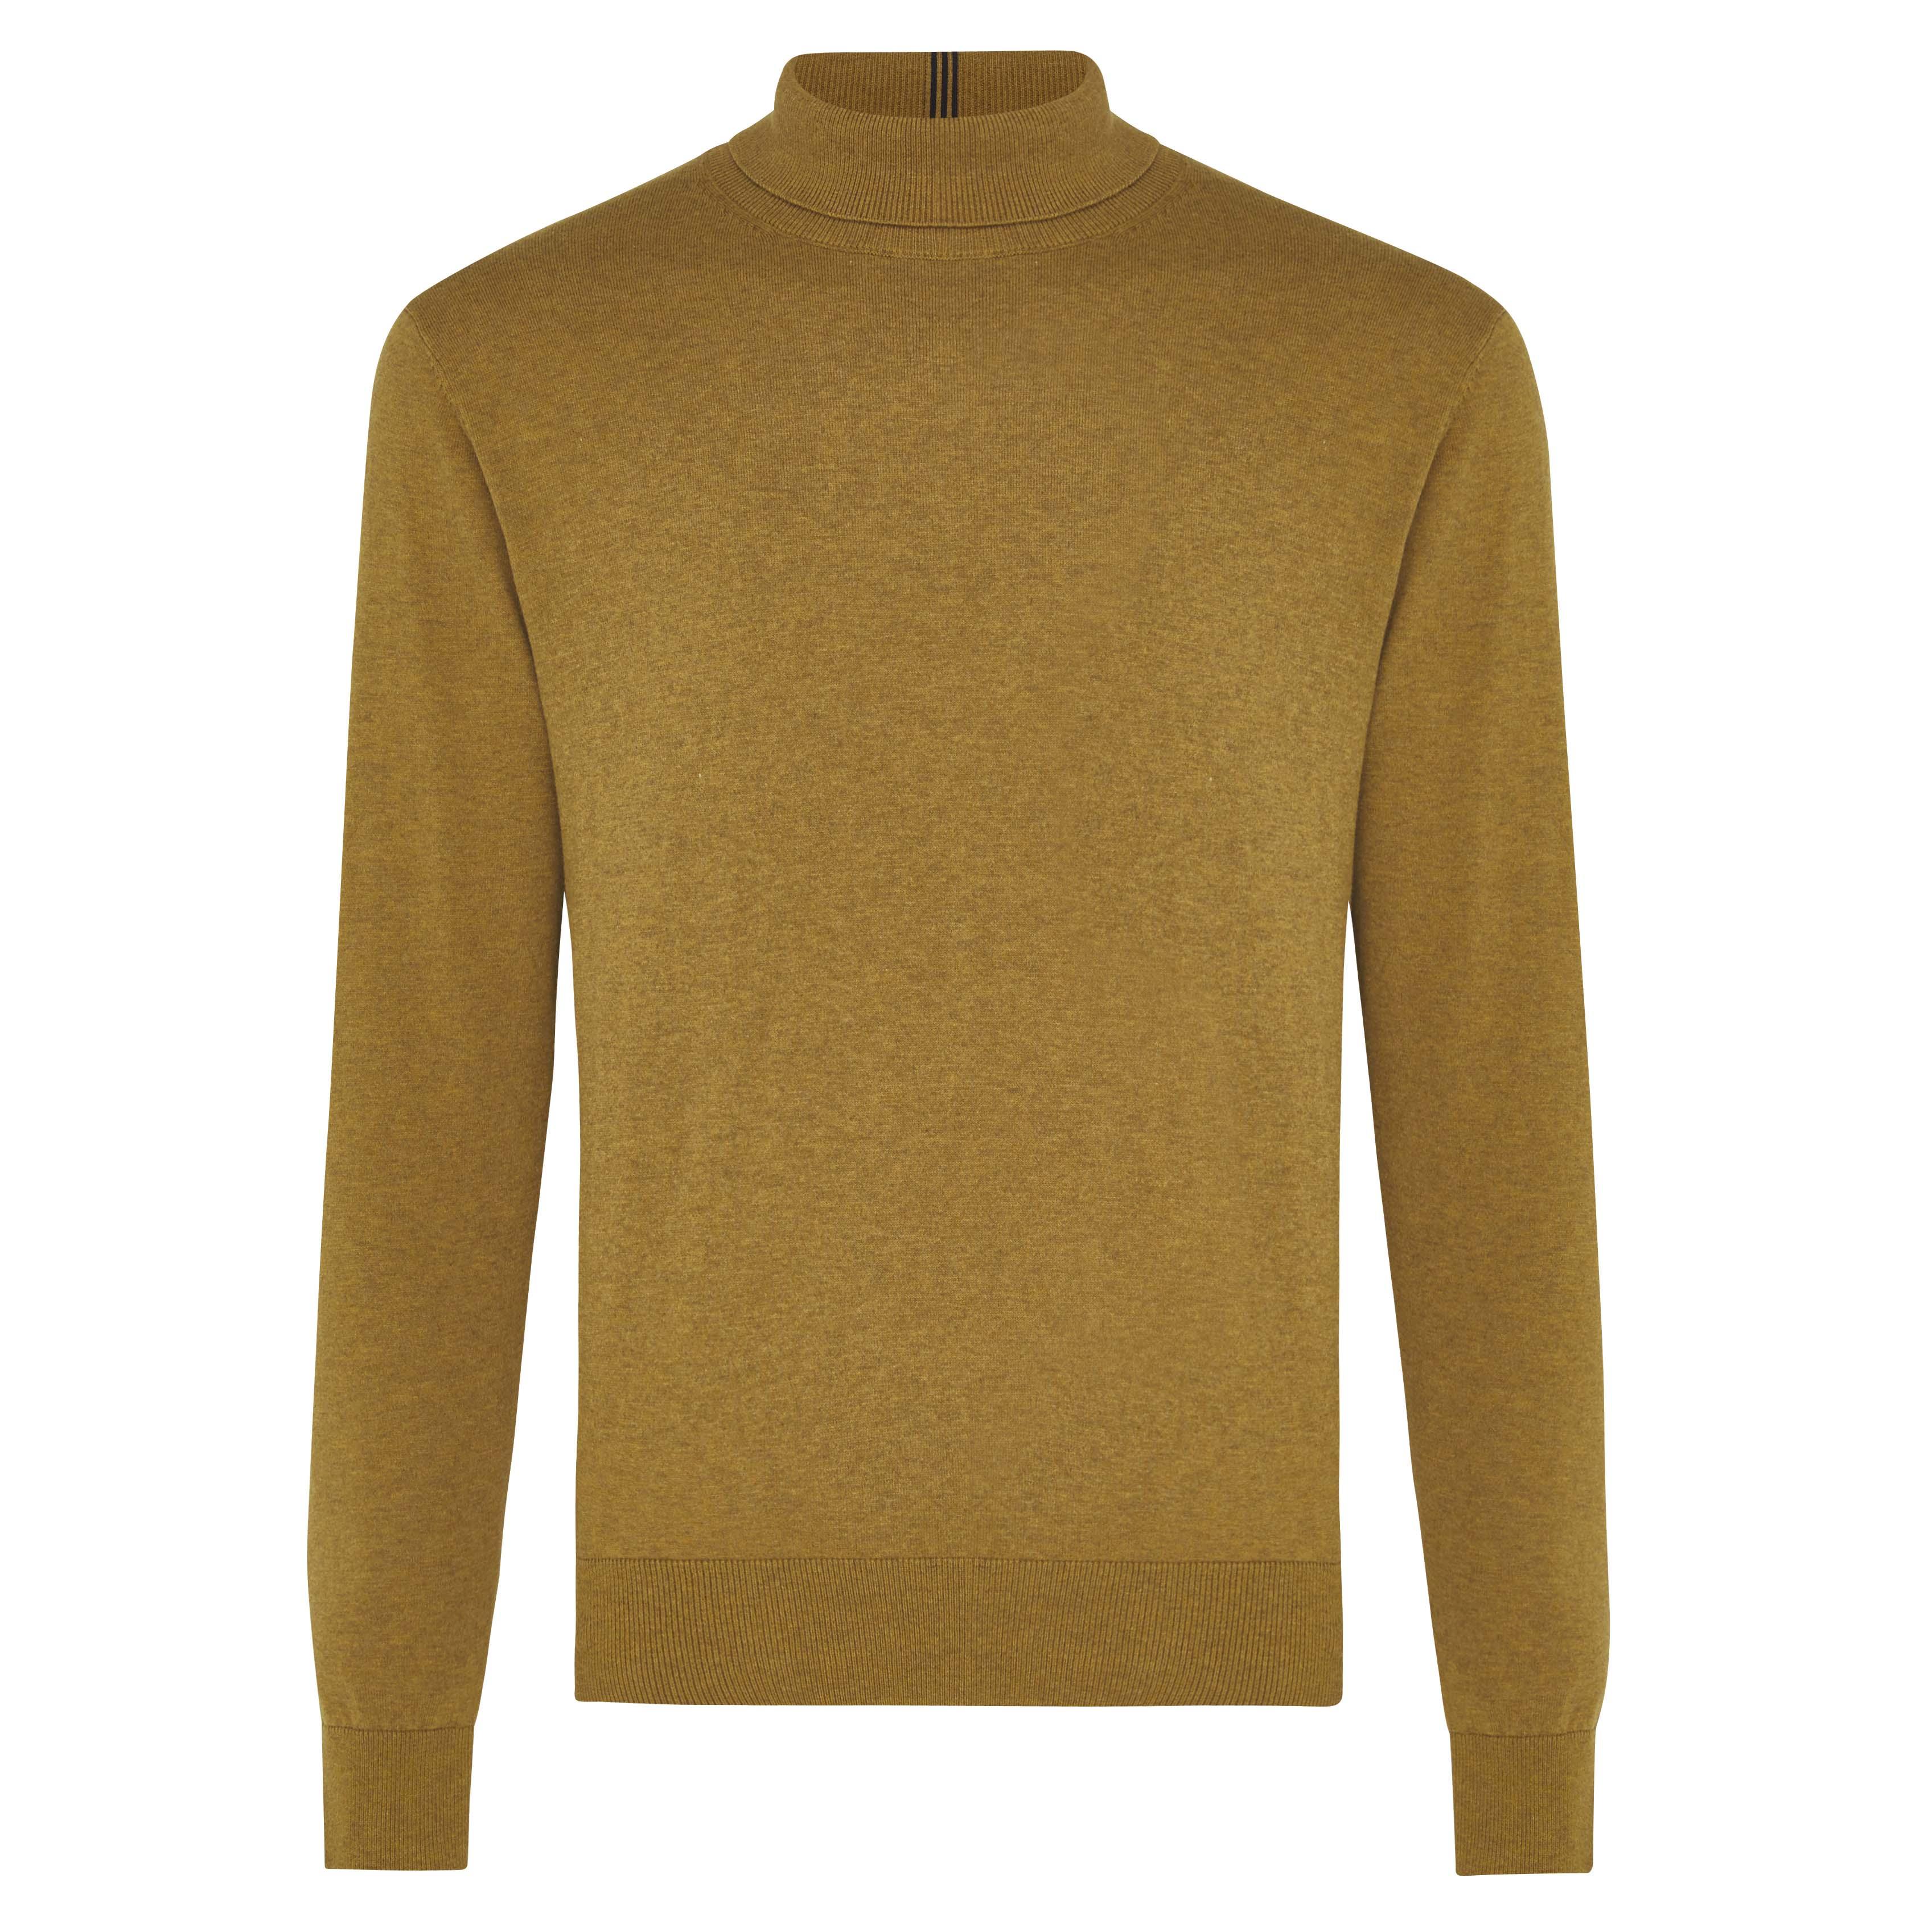 Jakob | Pullover turtleneck ocher yellow